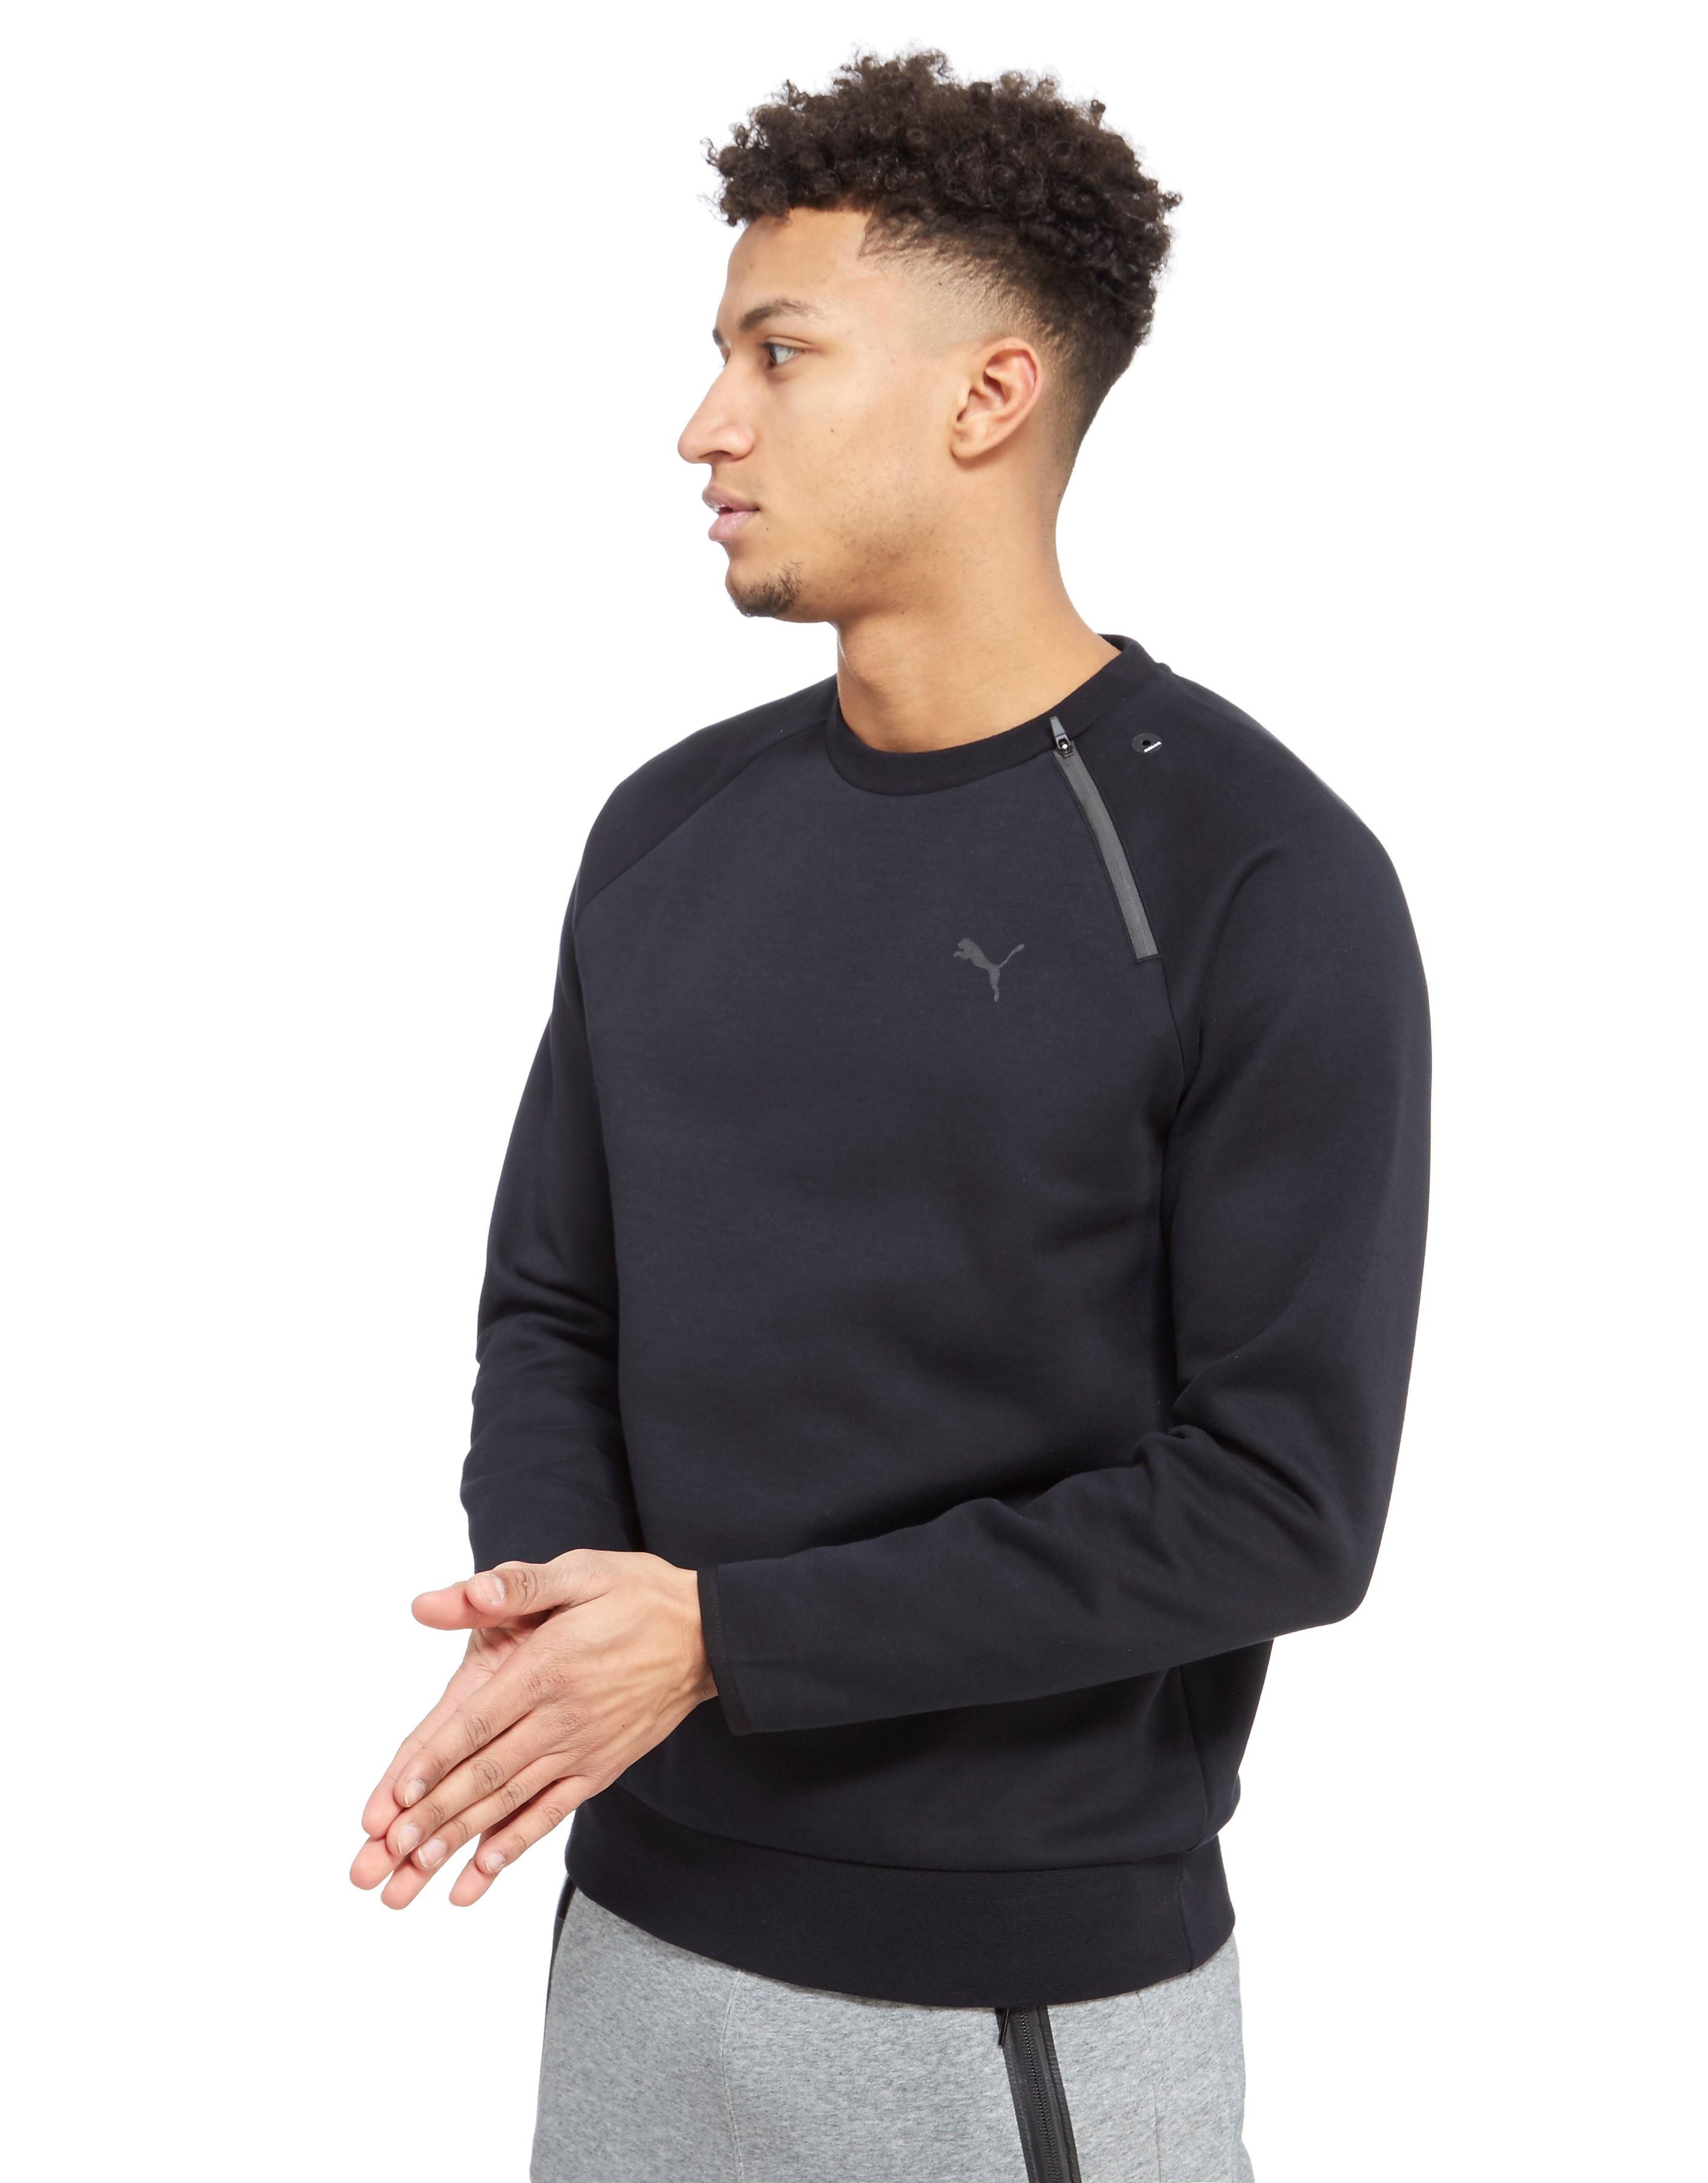 PUMA Evo Core Sweatshirt